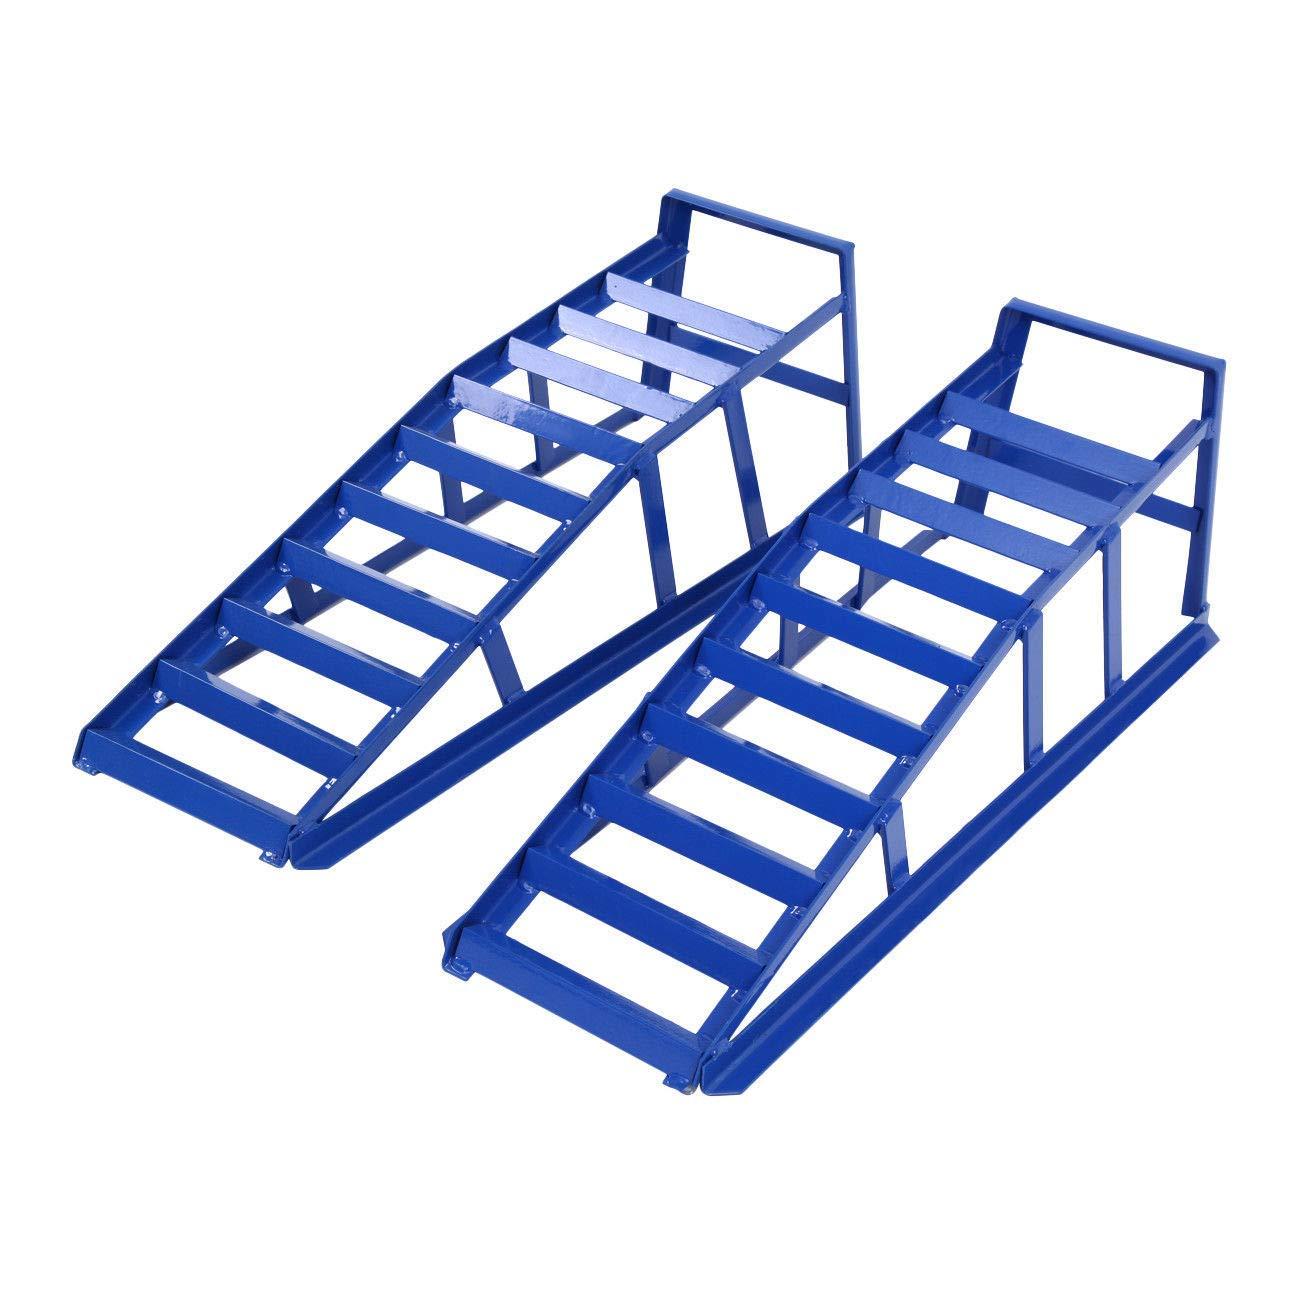 Samger 2Ton, rampa de acceso de acero para coches, rampa de carga, mantenimiento pesado, equipo de elevación azul